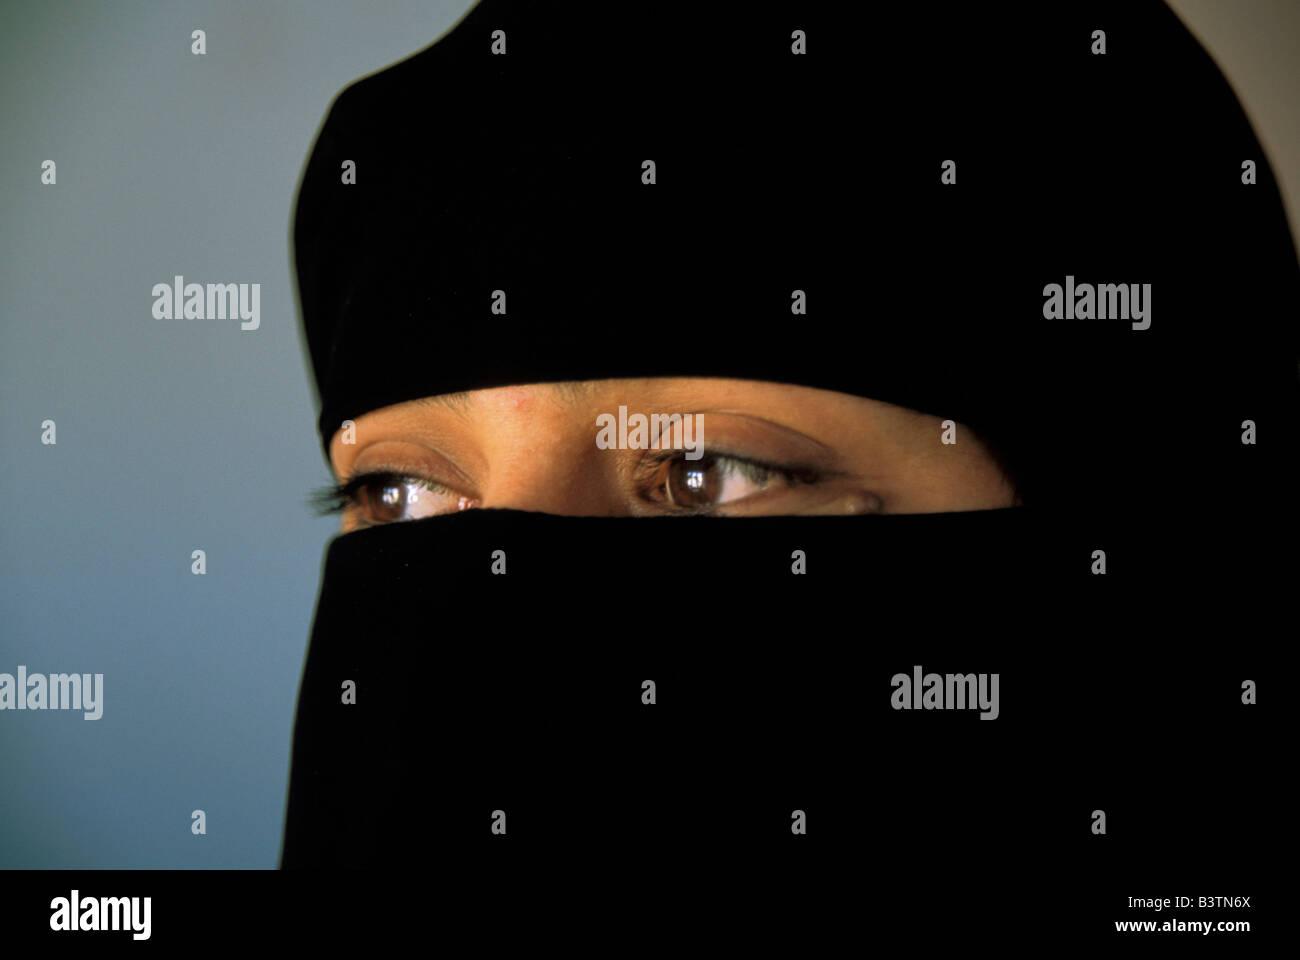 Asia, Yemen, Sana'a. Veiled woman. - Stock Image